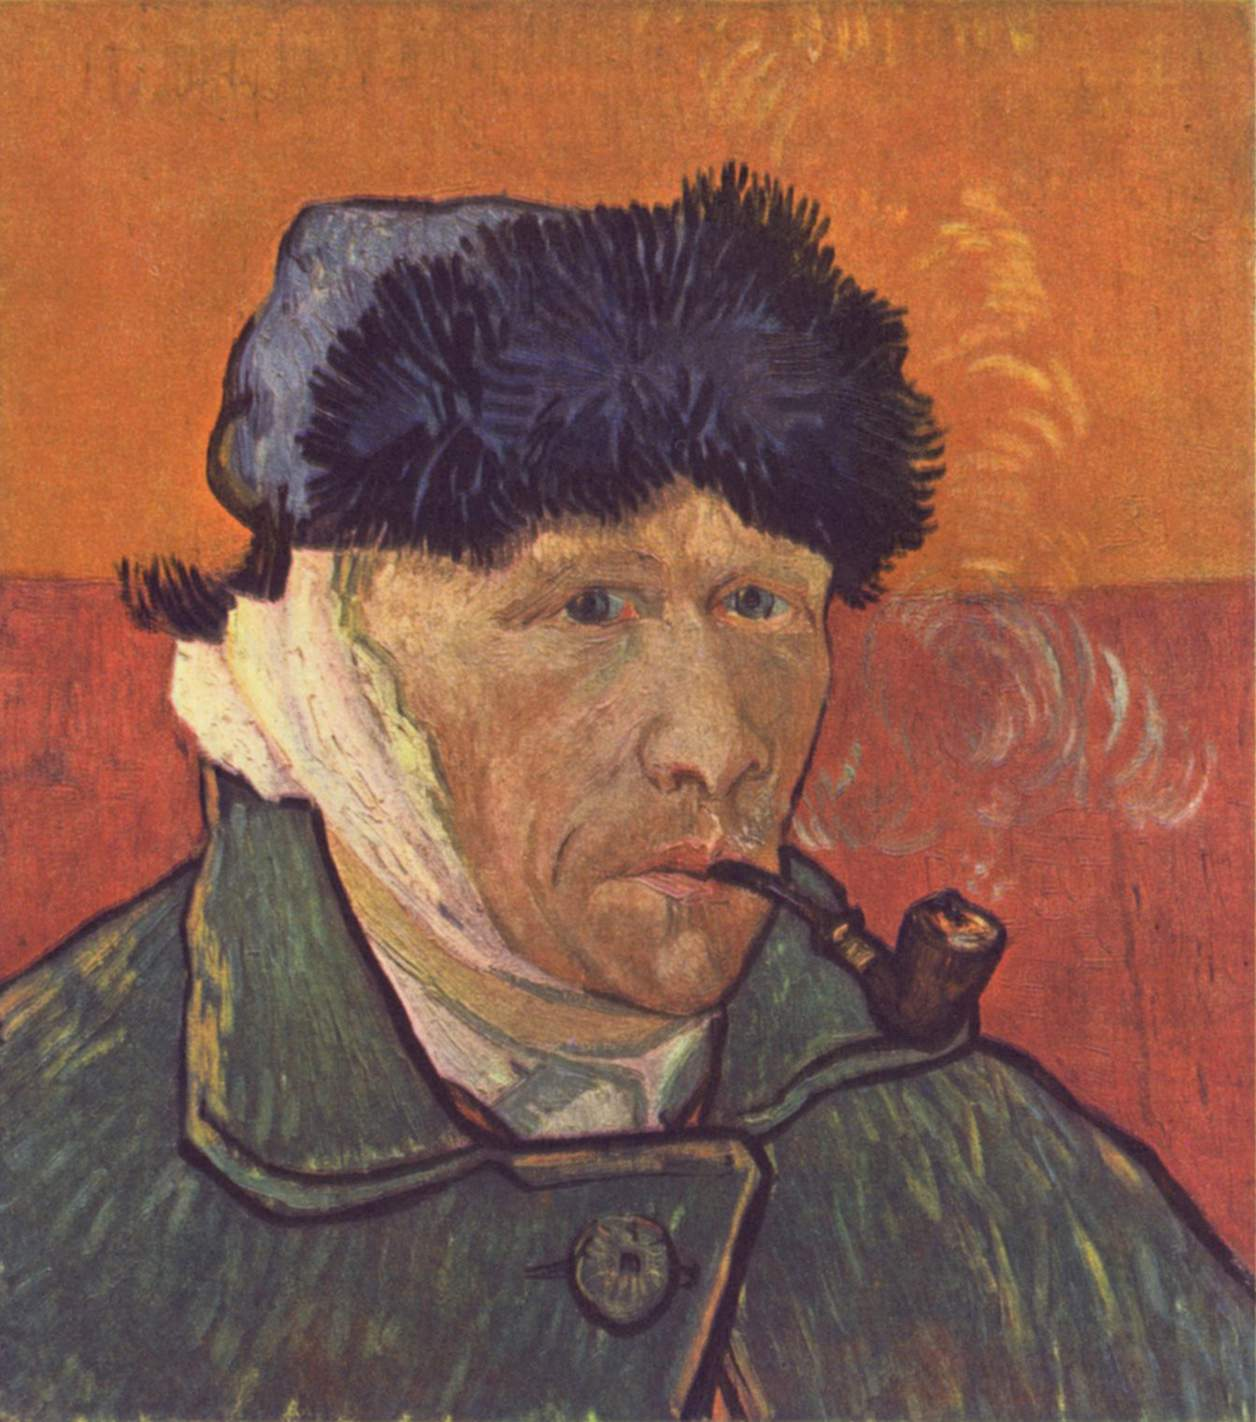 Self-portrait of Vincent Van Gogh, after he had cut off his right ear